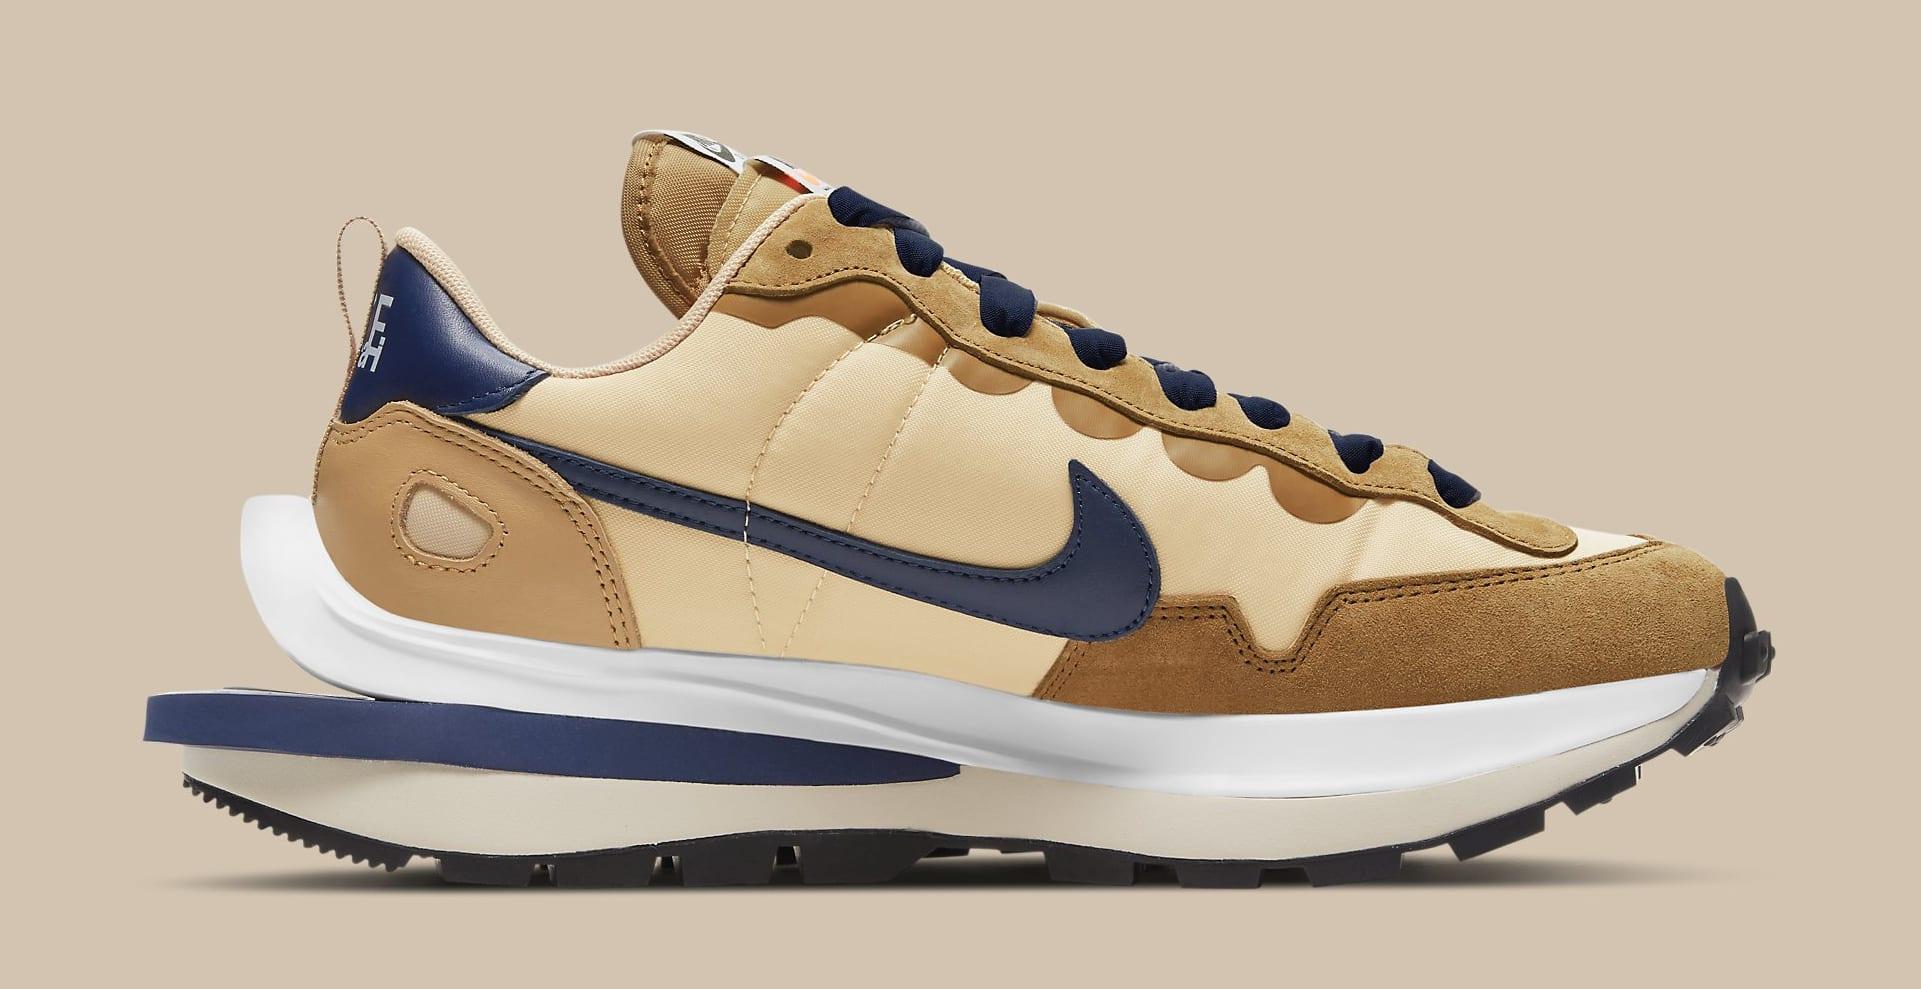 Sacai x Nike VaporWaffle 'Sesame/Blue Void' DD1875-200 Medial